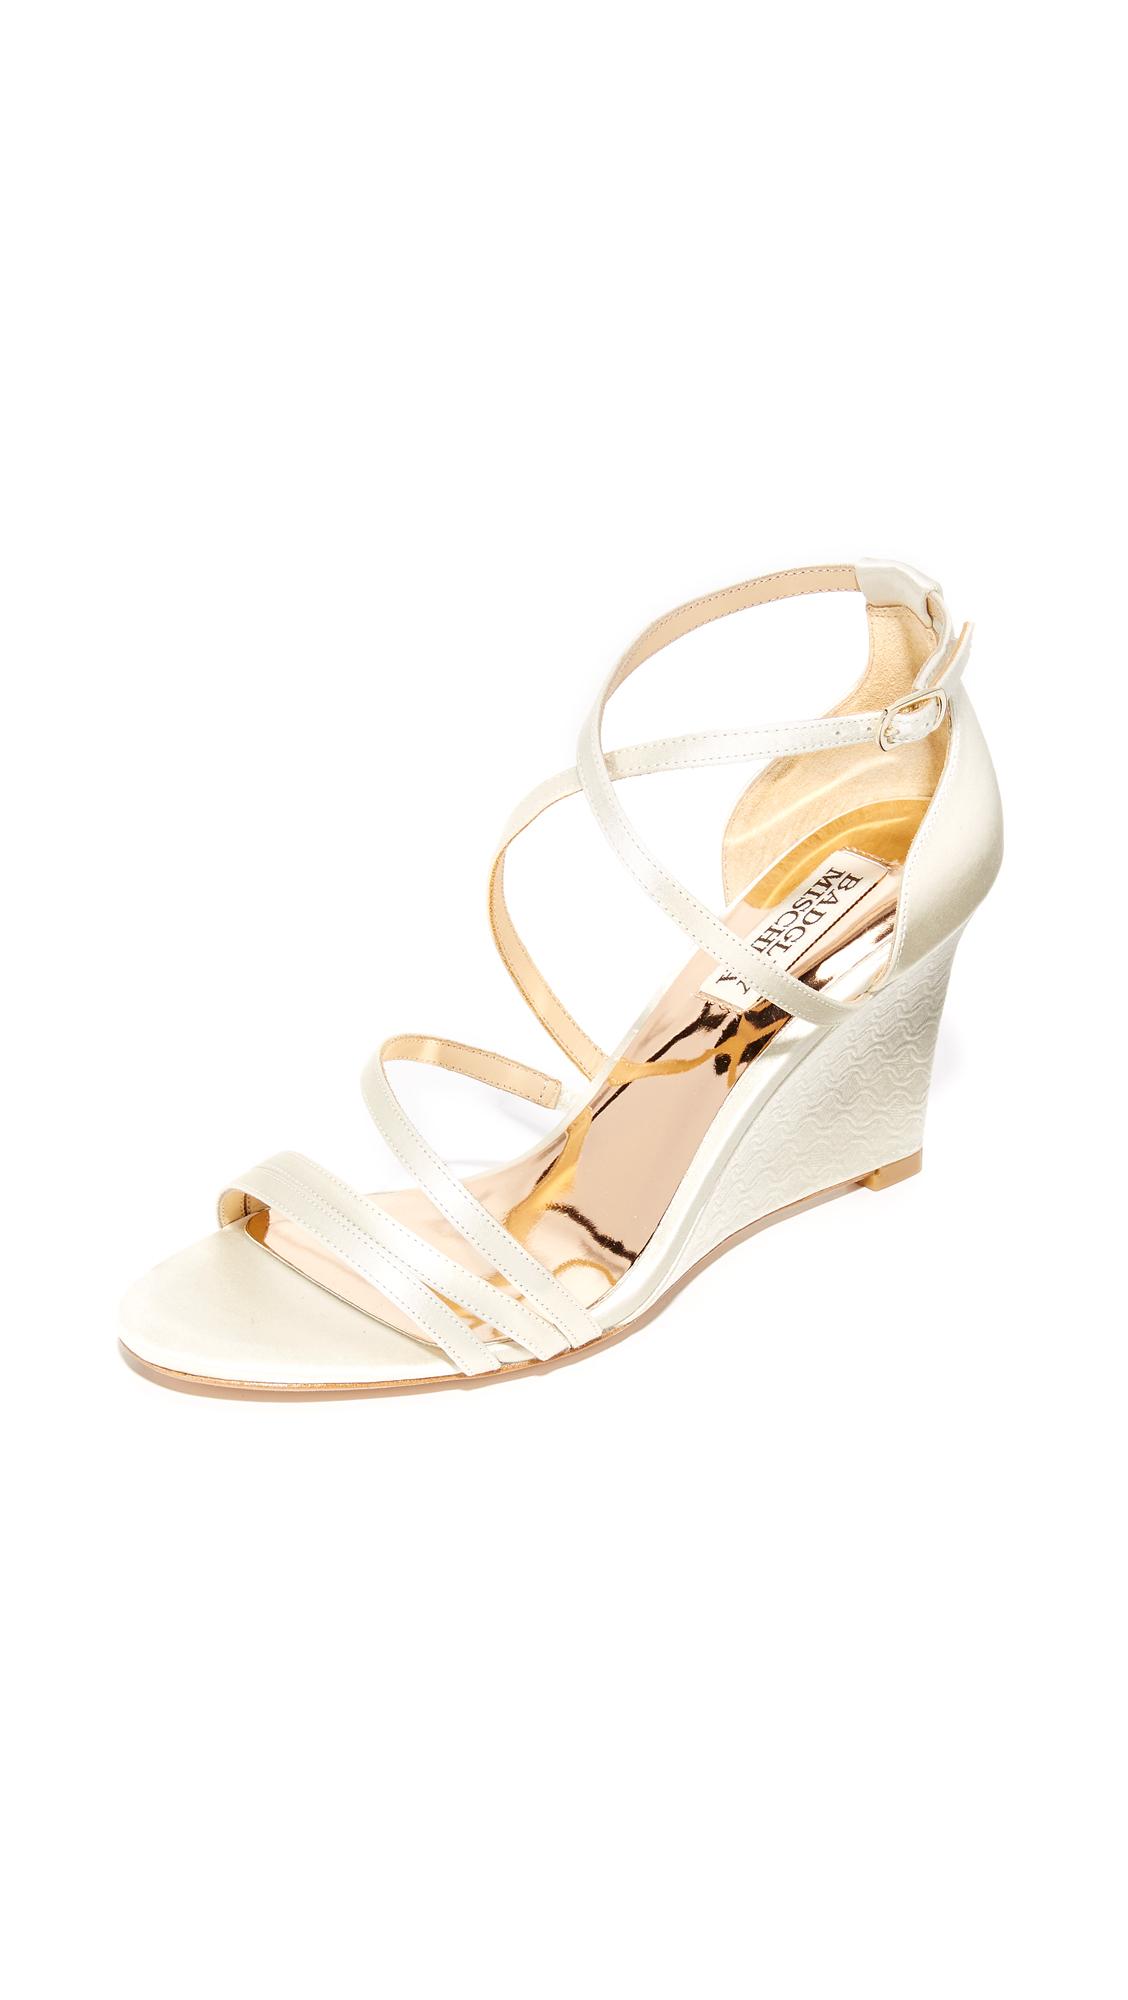 Photo of Badgley Mischka Bonanza Wedge Sandals Ivory - Badgley Mischka online